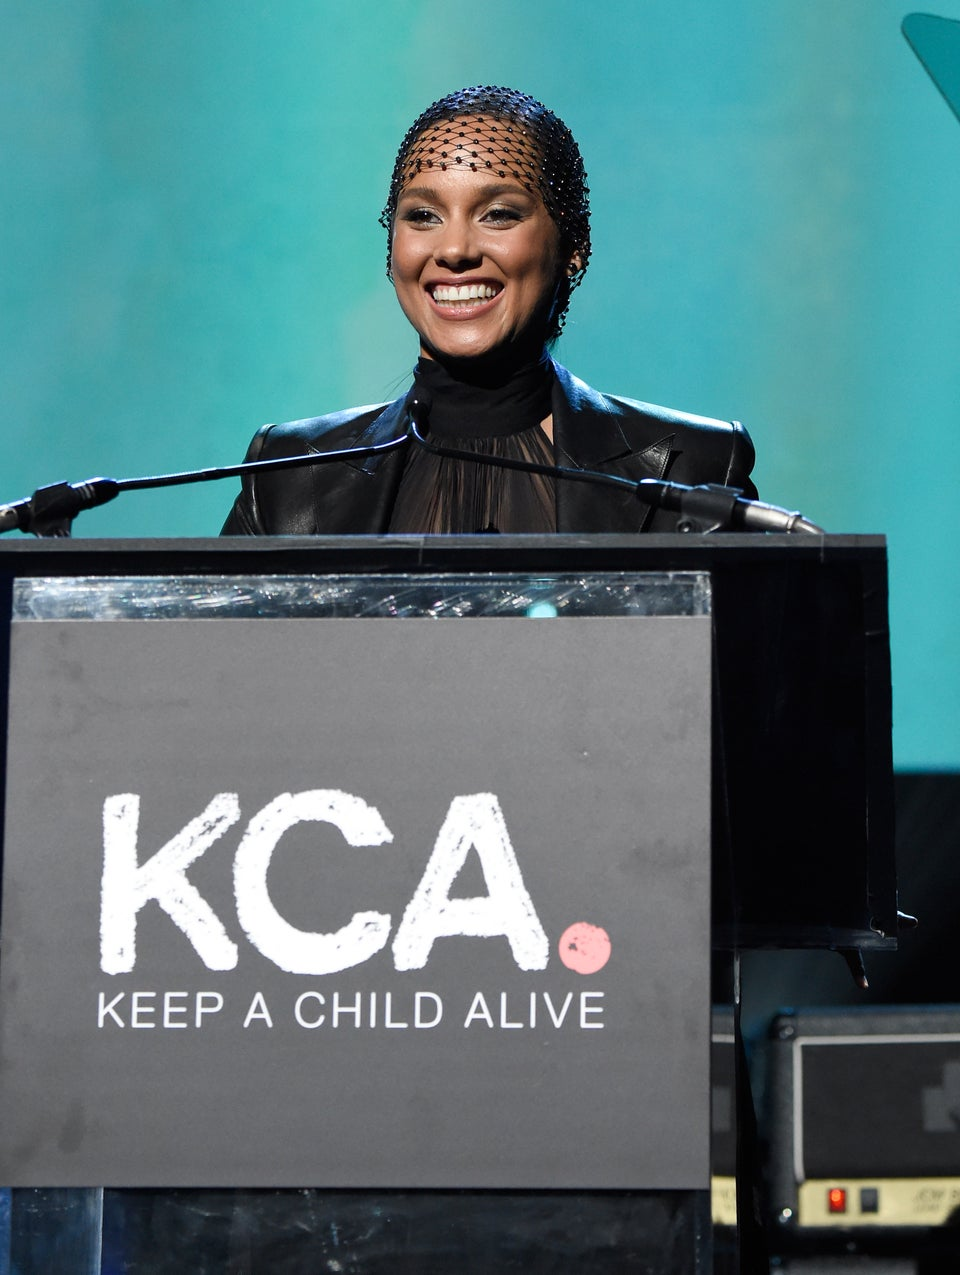 Janelle Monae, Taraji P. Henson & Laila Ali Are New Ambassadors for Alicia Keys' Keep A Child Alive Foundation